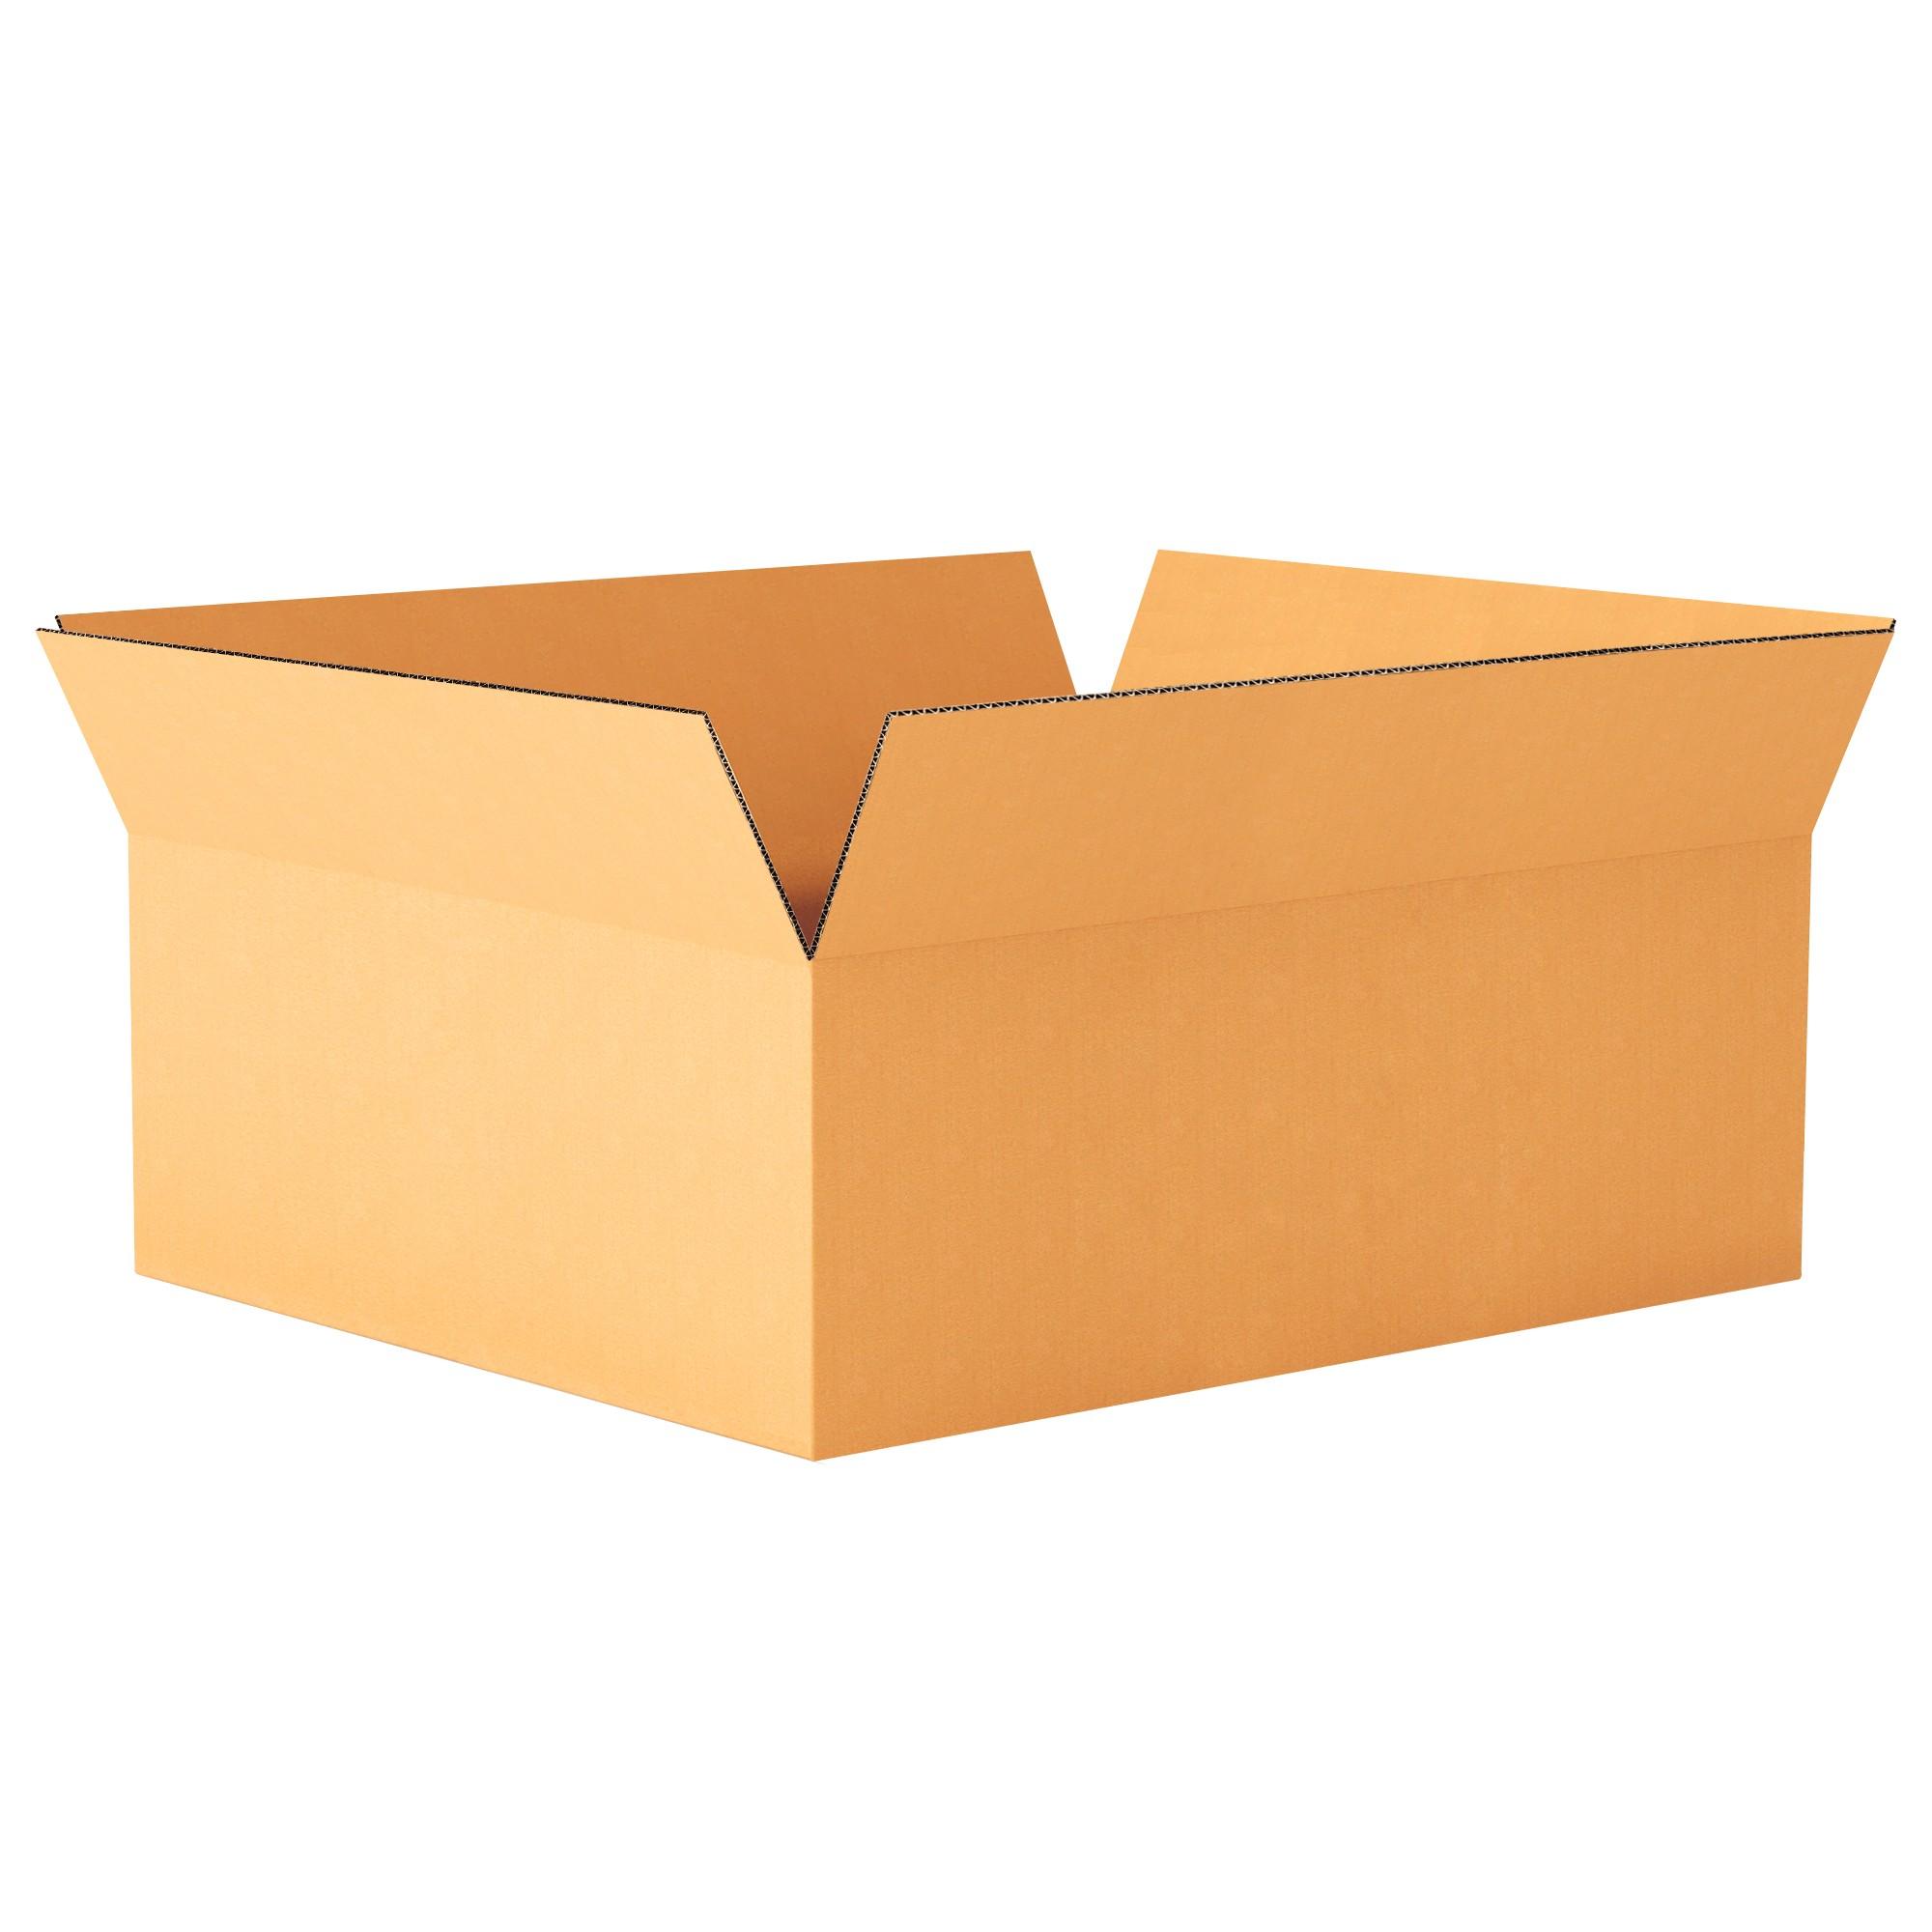 "TOTALPACK® 24 x 18 1/2 x 23"" Single Wall Corrugated UPS 108 Boxes 15 Units"